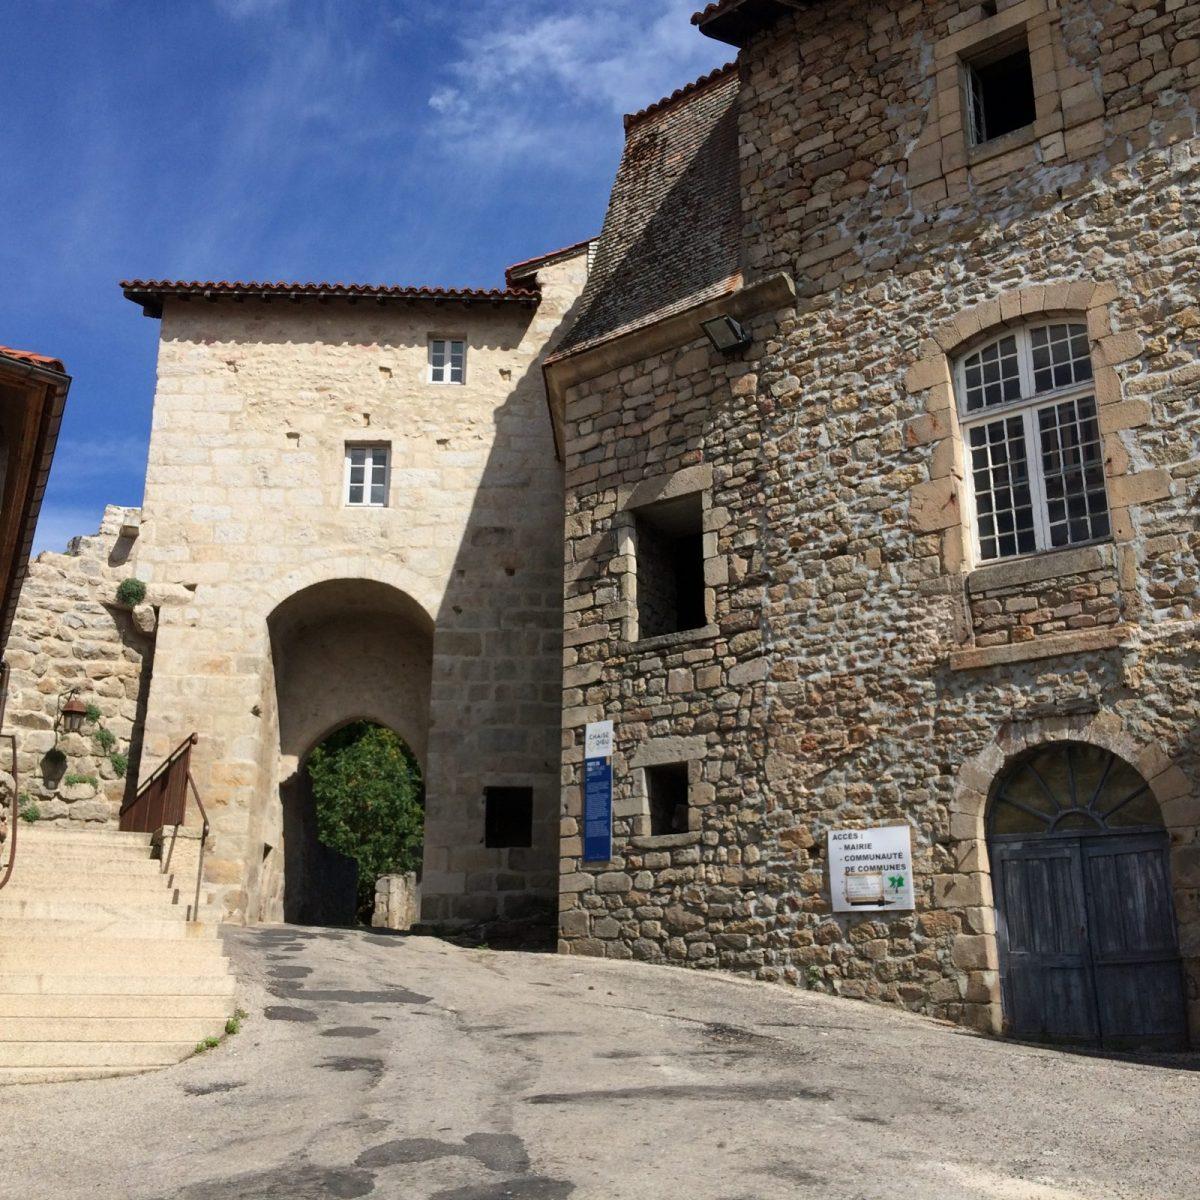 EVE_Visite du bourg médiéval _Porte du For